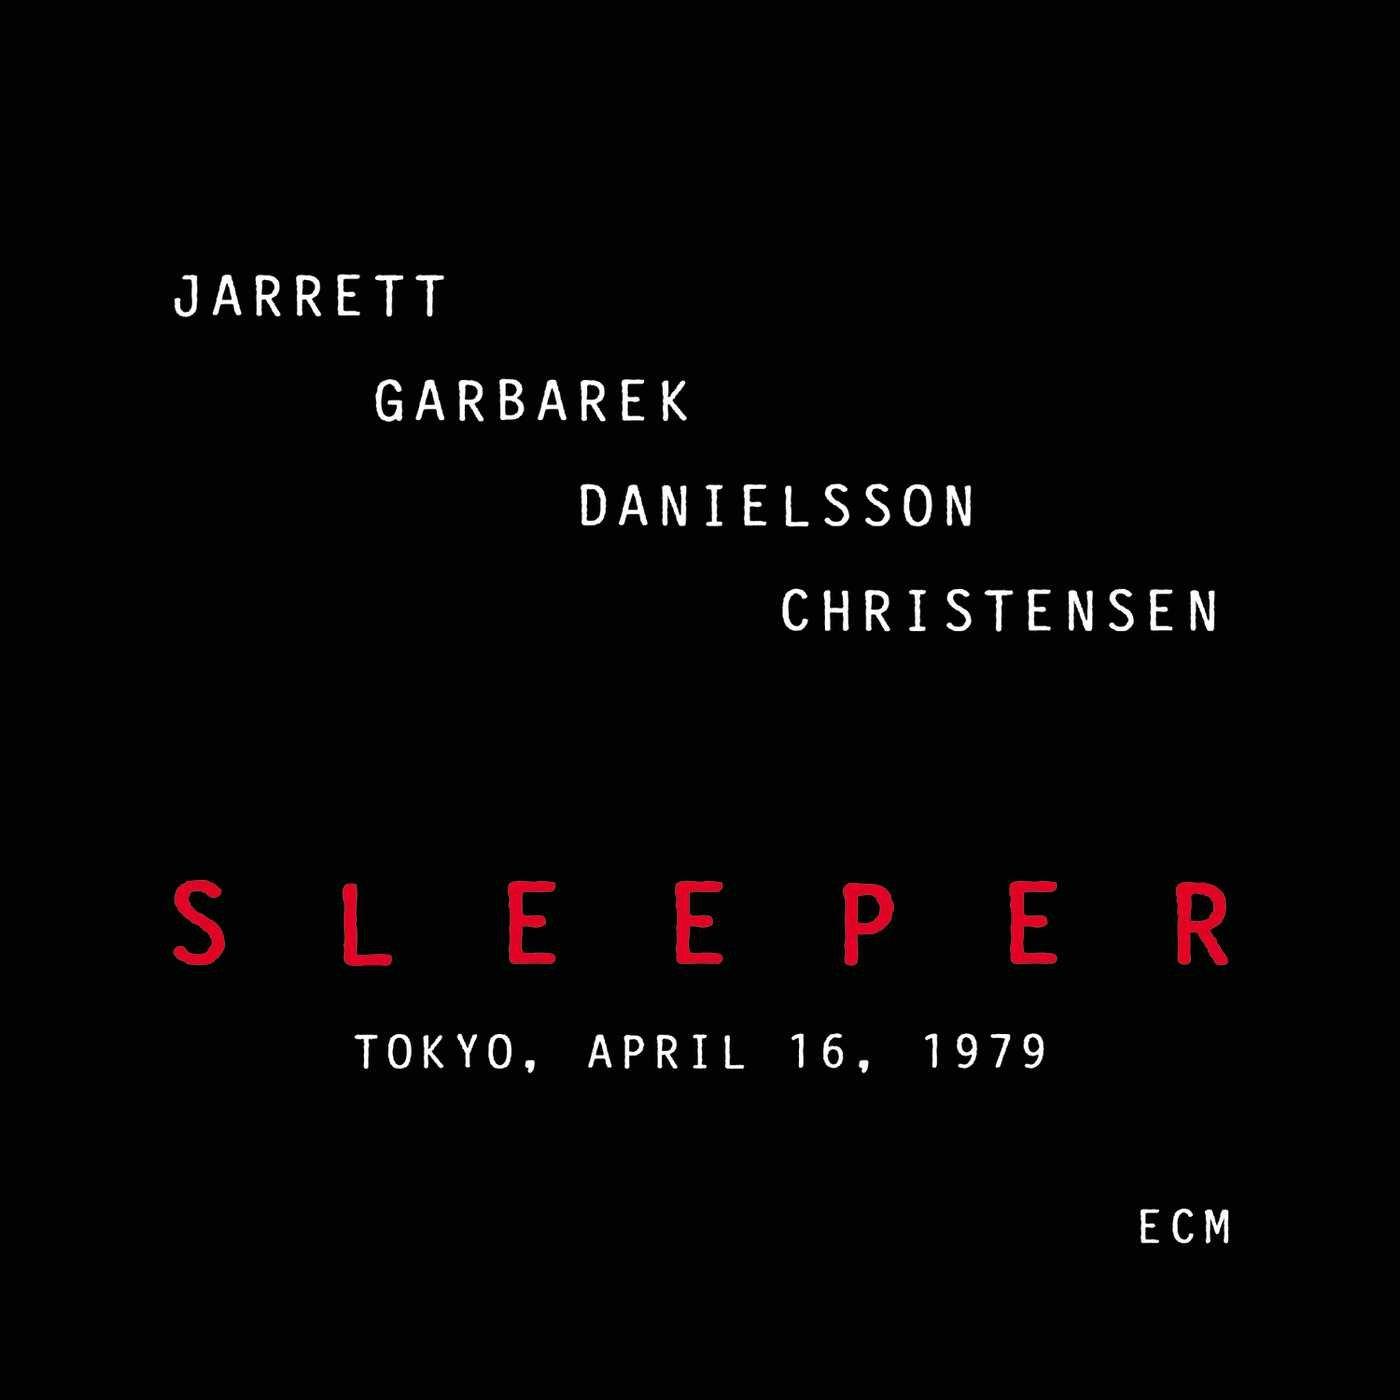 Keith Jarrett - Sleeper (2012) [FLAC] Download